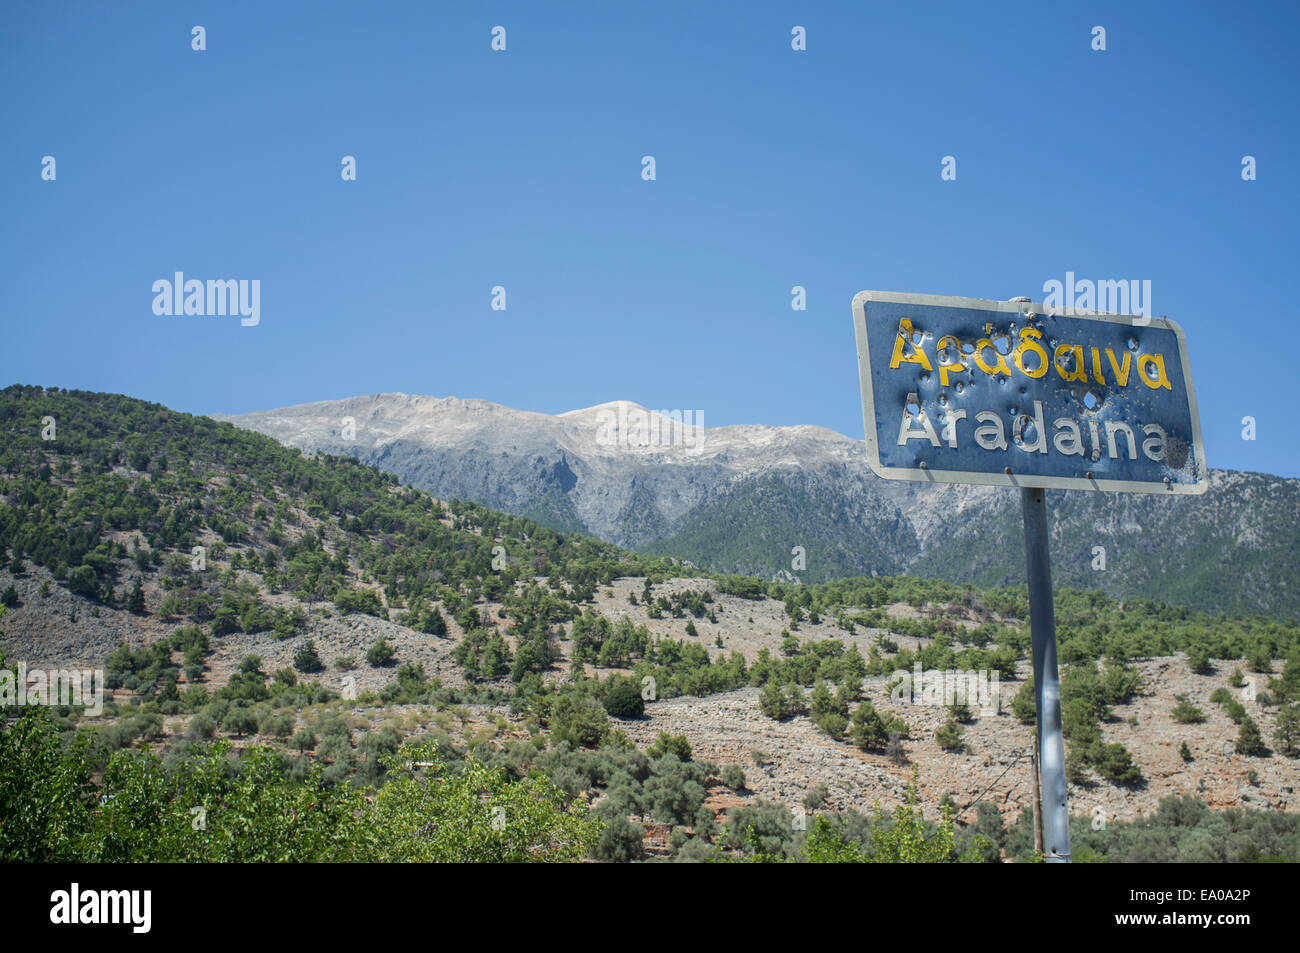 Bullet ridden sign, Aradaina, Crete - Stock Image